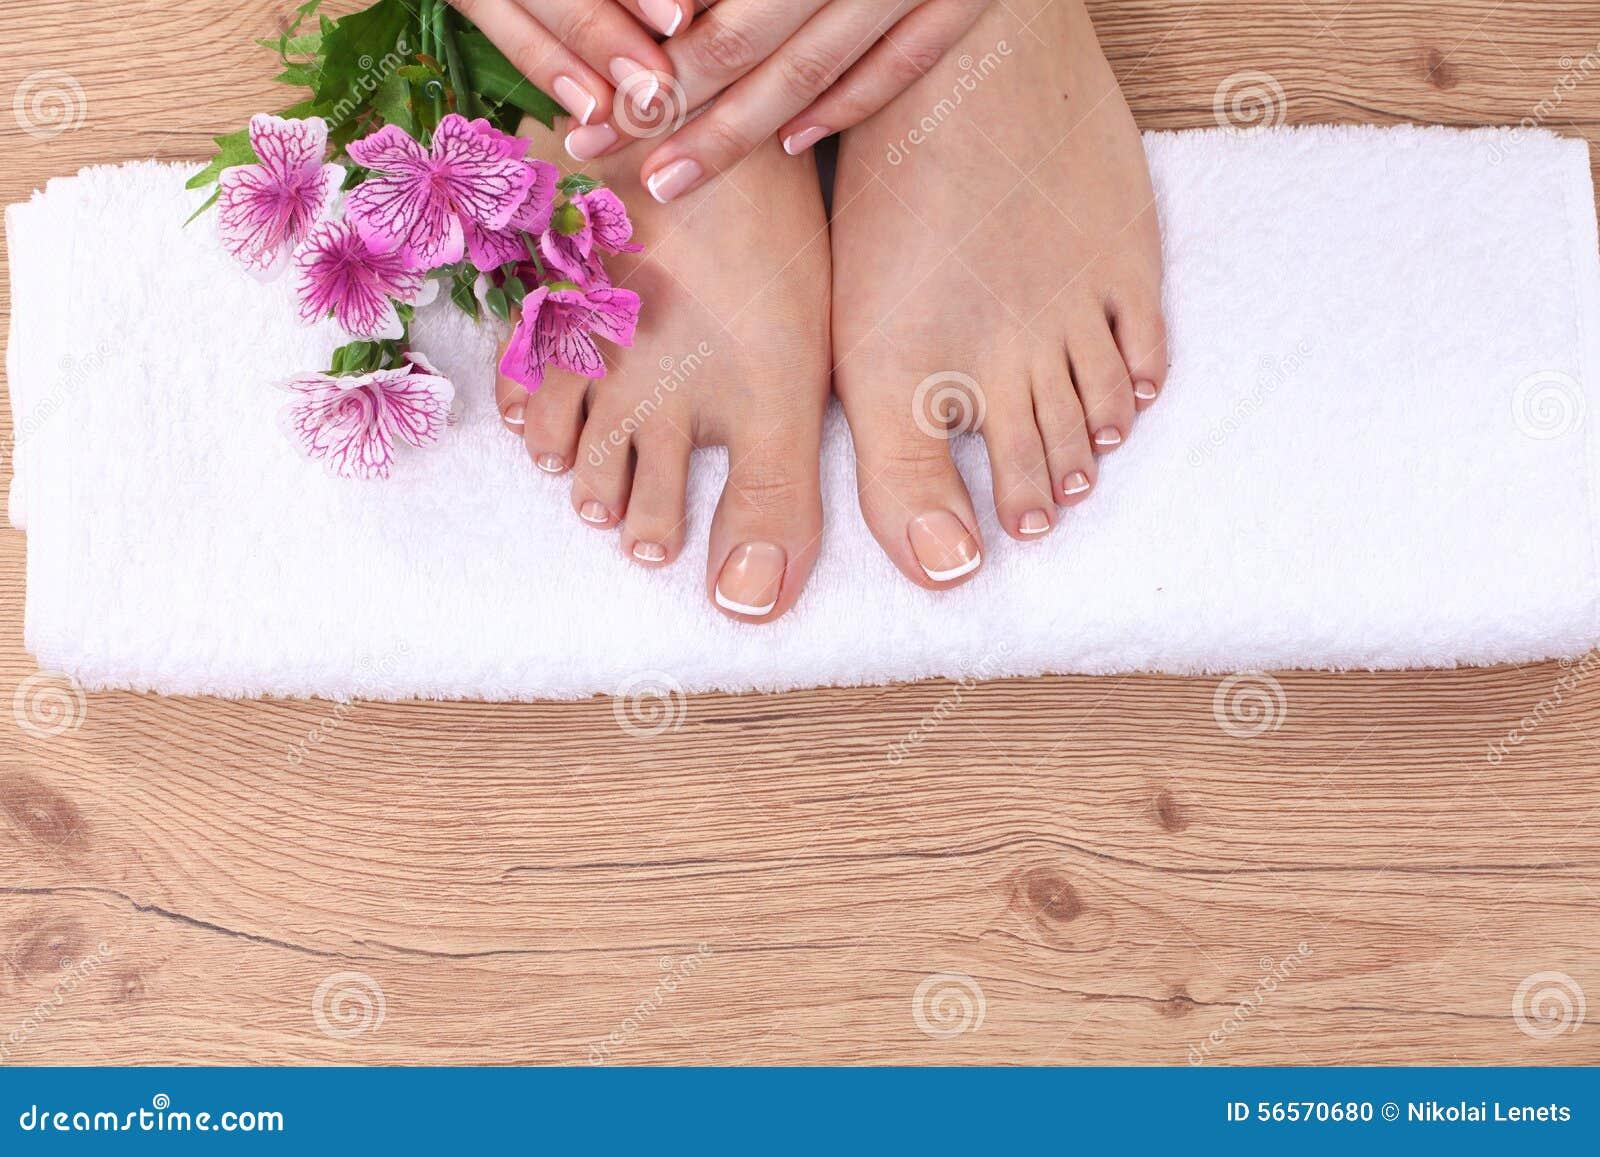 Download Όμορφα πόδια με το τέλειο γαλλικό καρφί SPA Στοκ Εικόνες - εικόνα από σαλόνι, κρέμα: 56570680